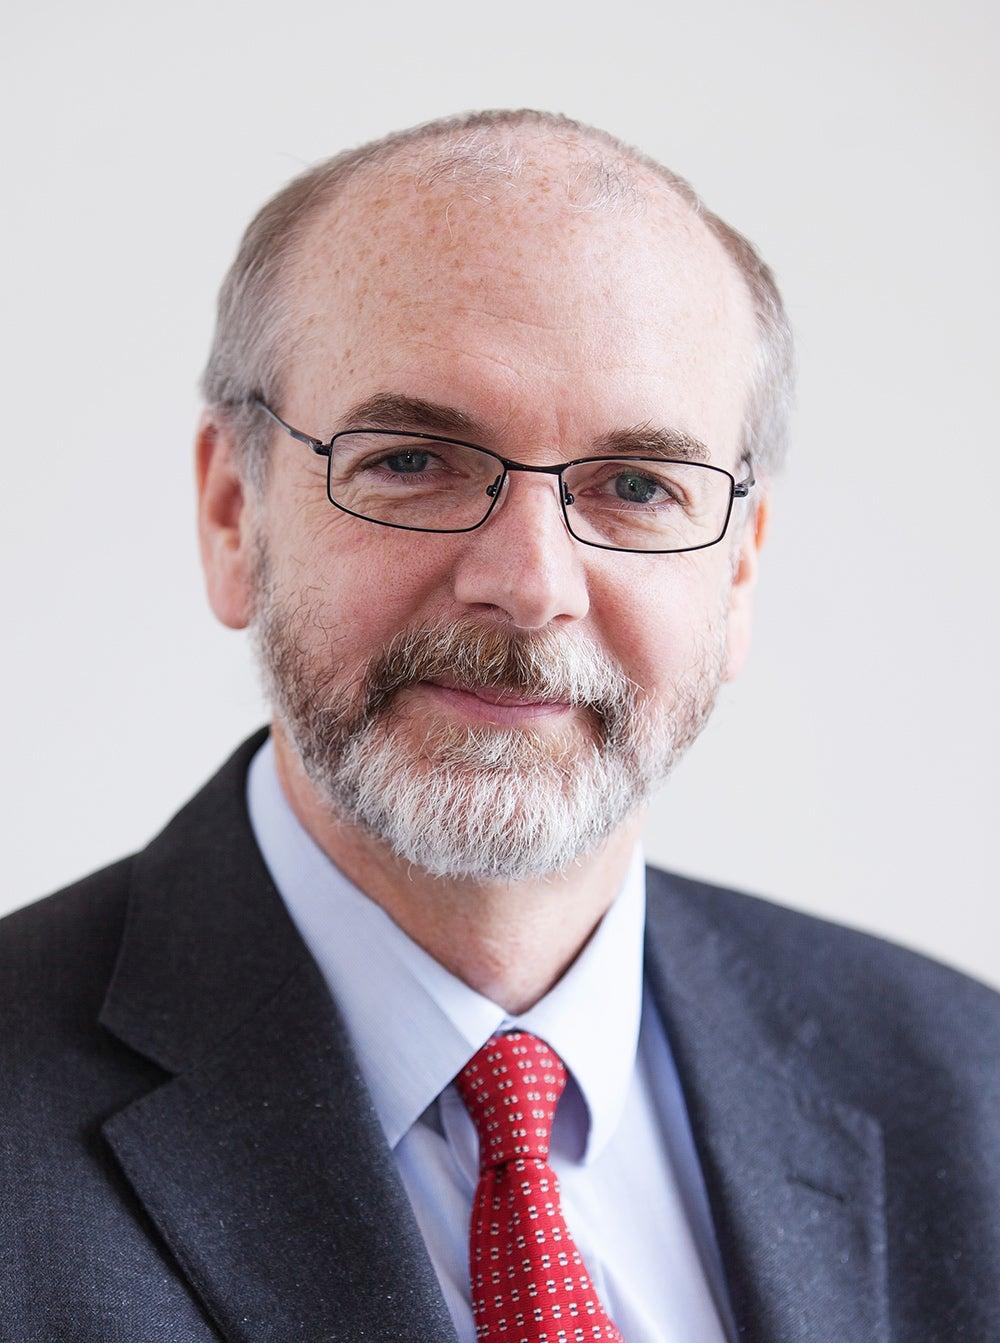 Andrew Pollard